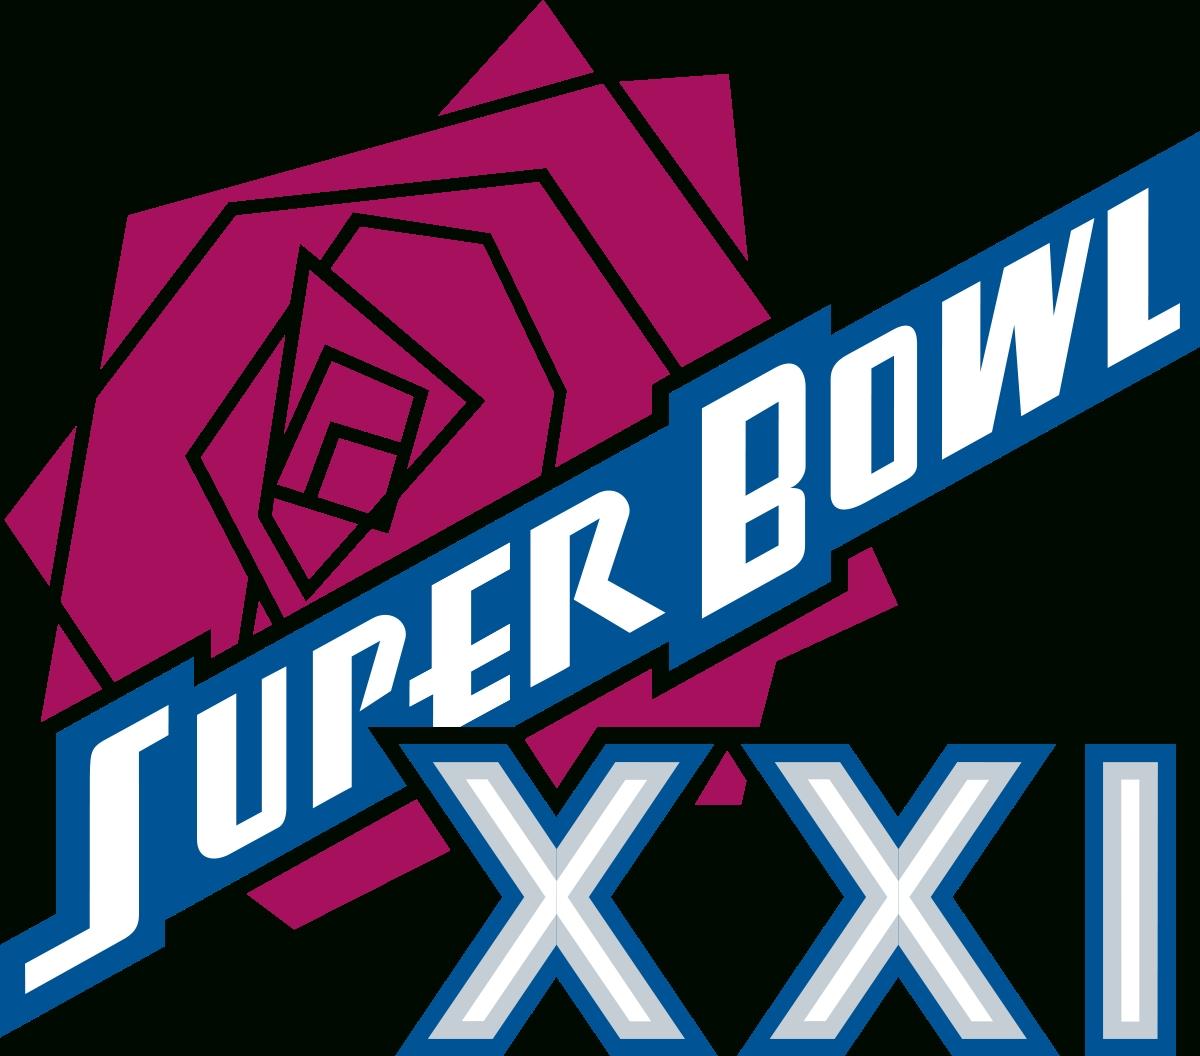 Super Bowl Xxi - Wikipedia for Super Bowl 25 Winner